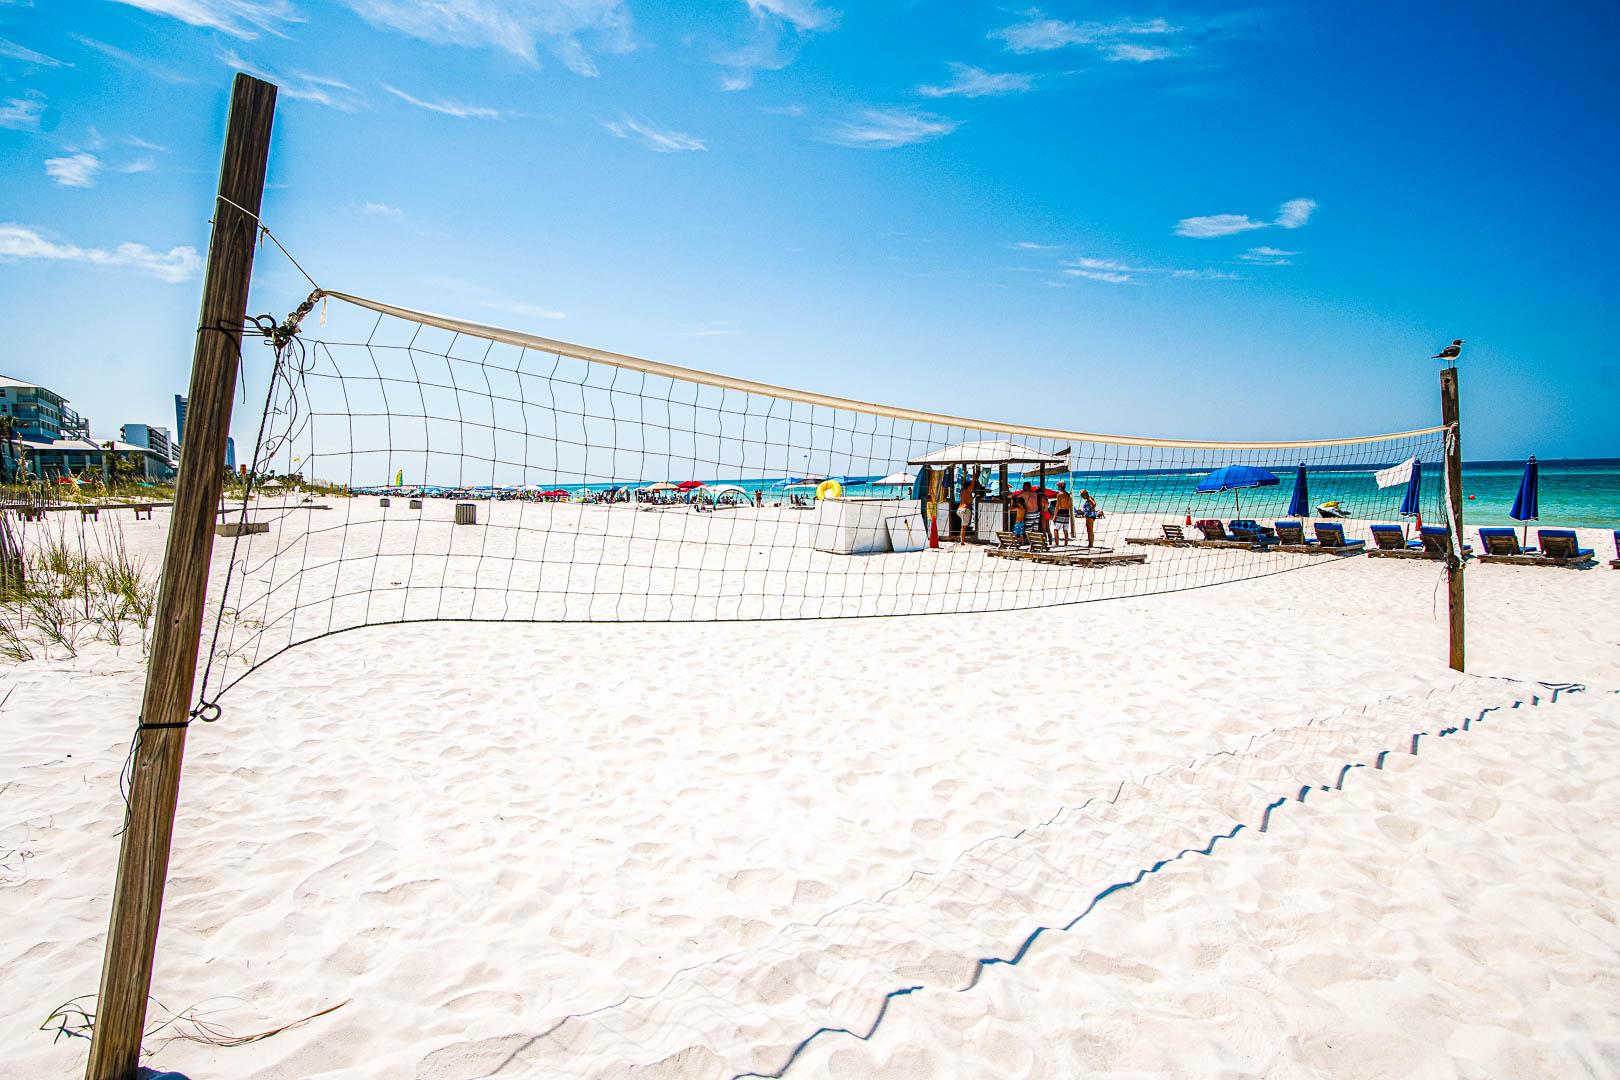 Volleyball onsite at VRI's Landmark Holiday Beach Resort in Panama City, Florida.